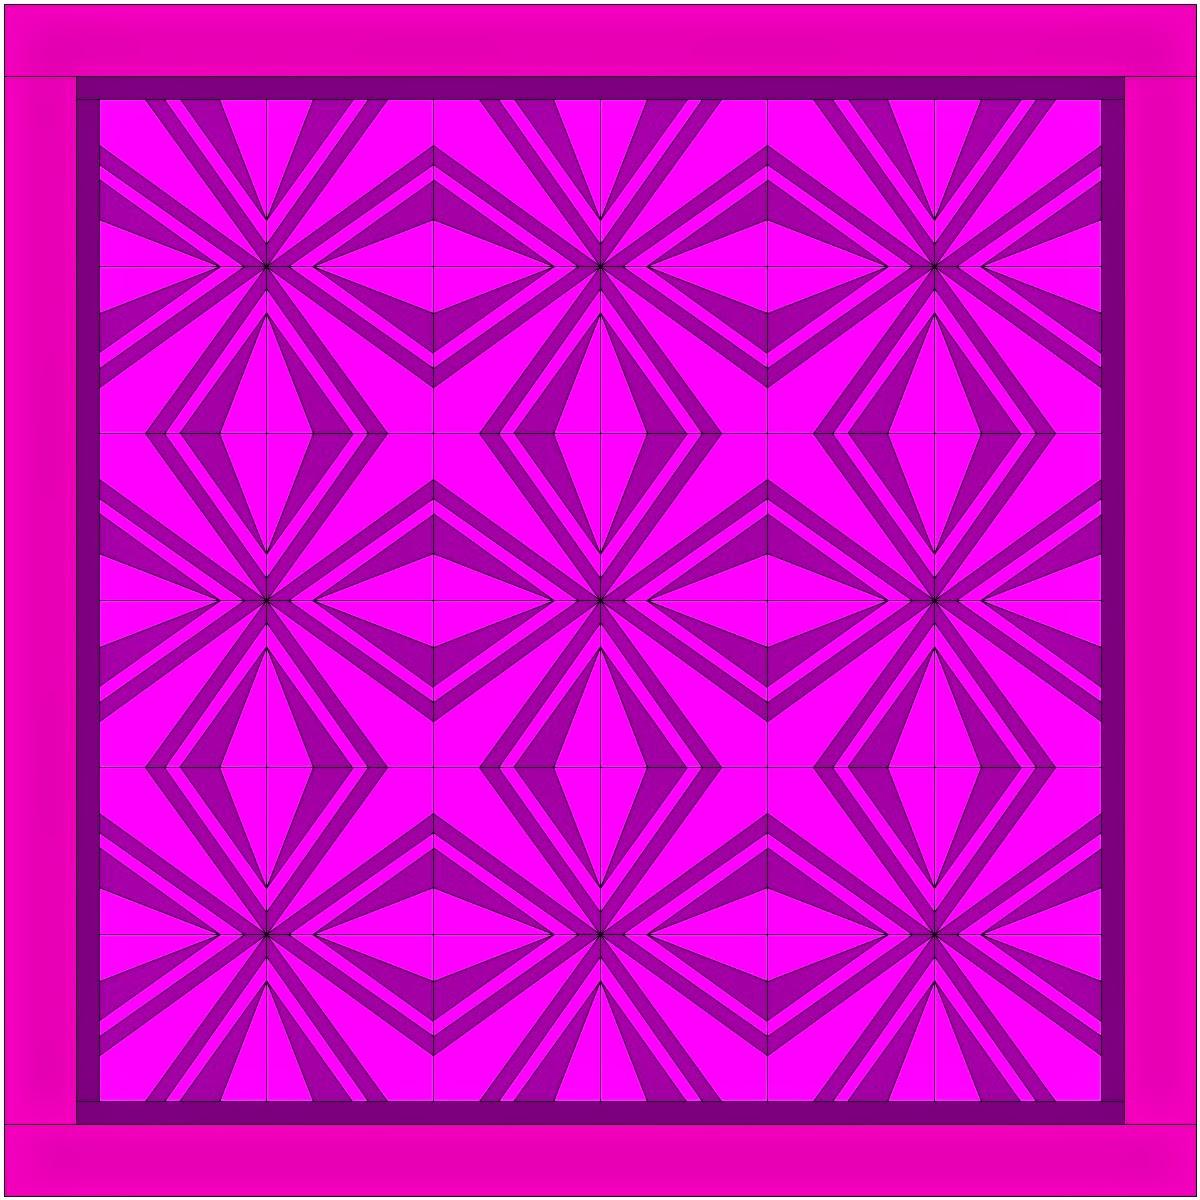 Adventurous Quilter: Two Color quilt pattern design